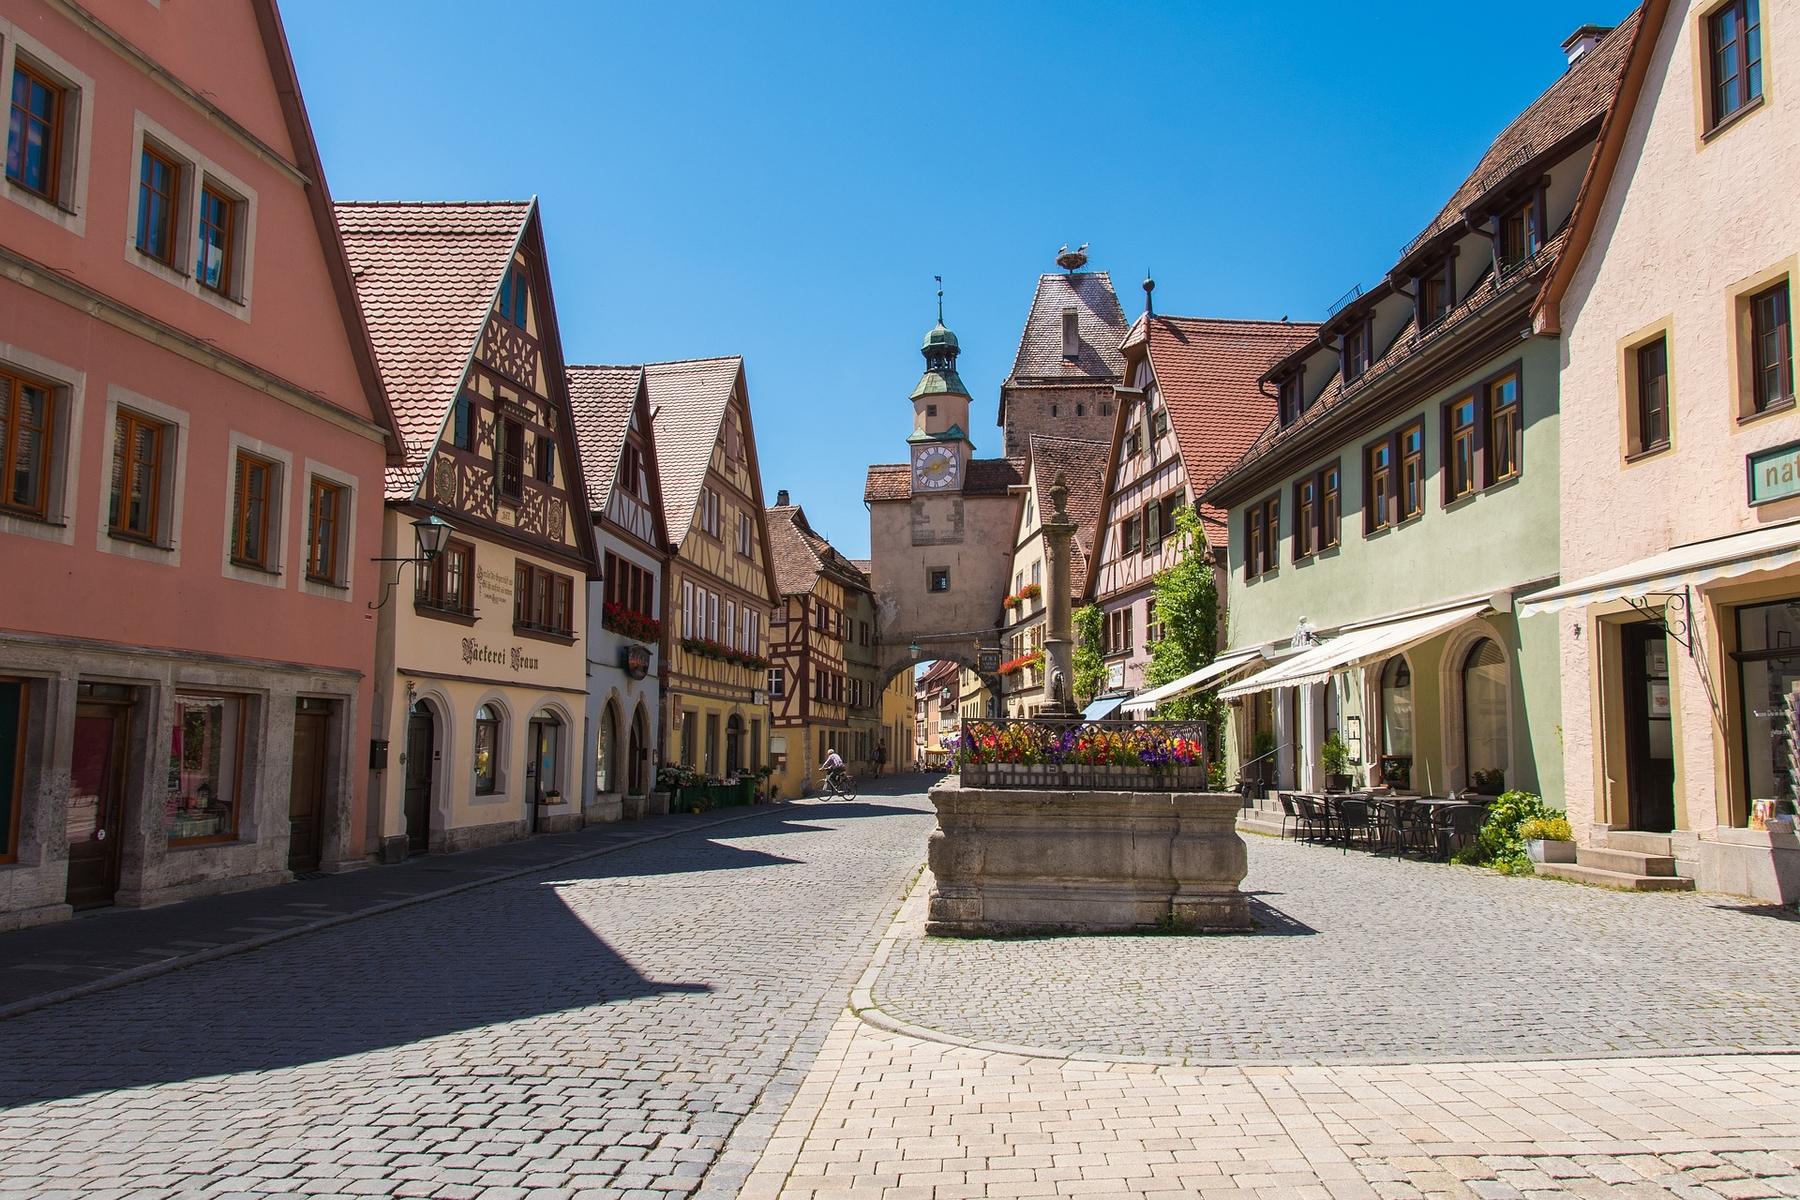 Mooie plaatsen Duitsland Rothenburg ob der Tauber in Beieren